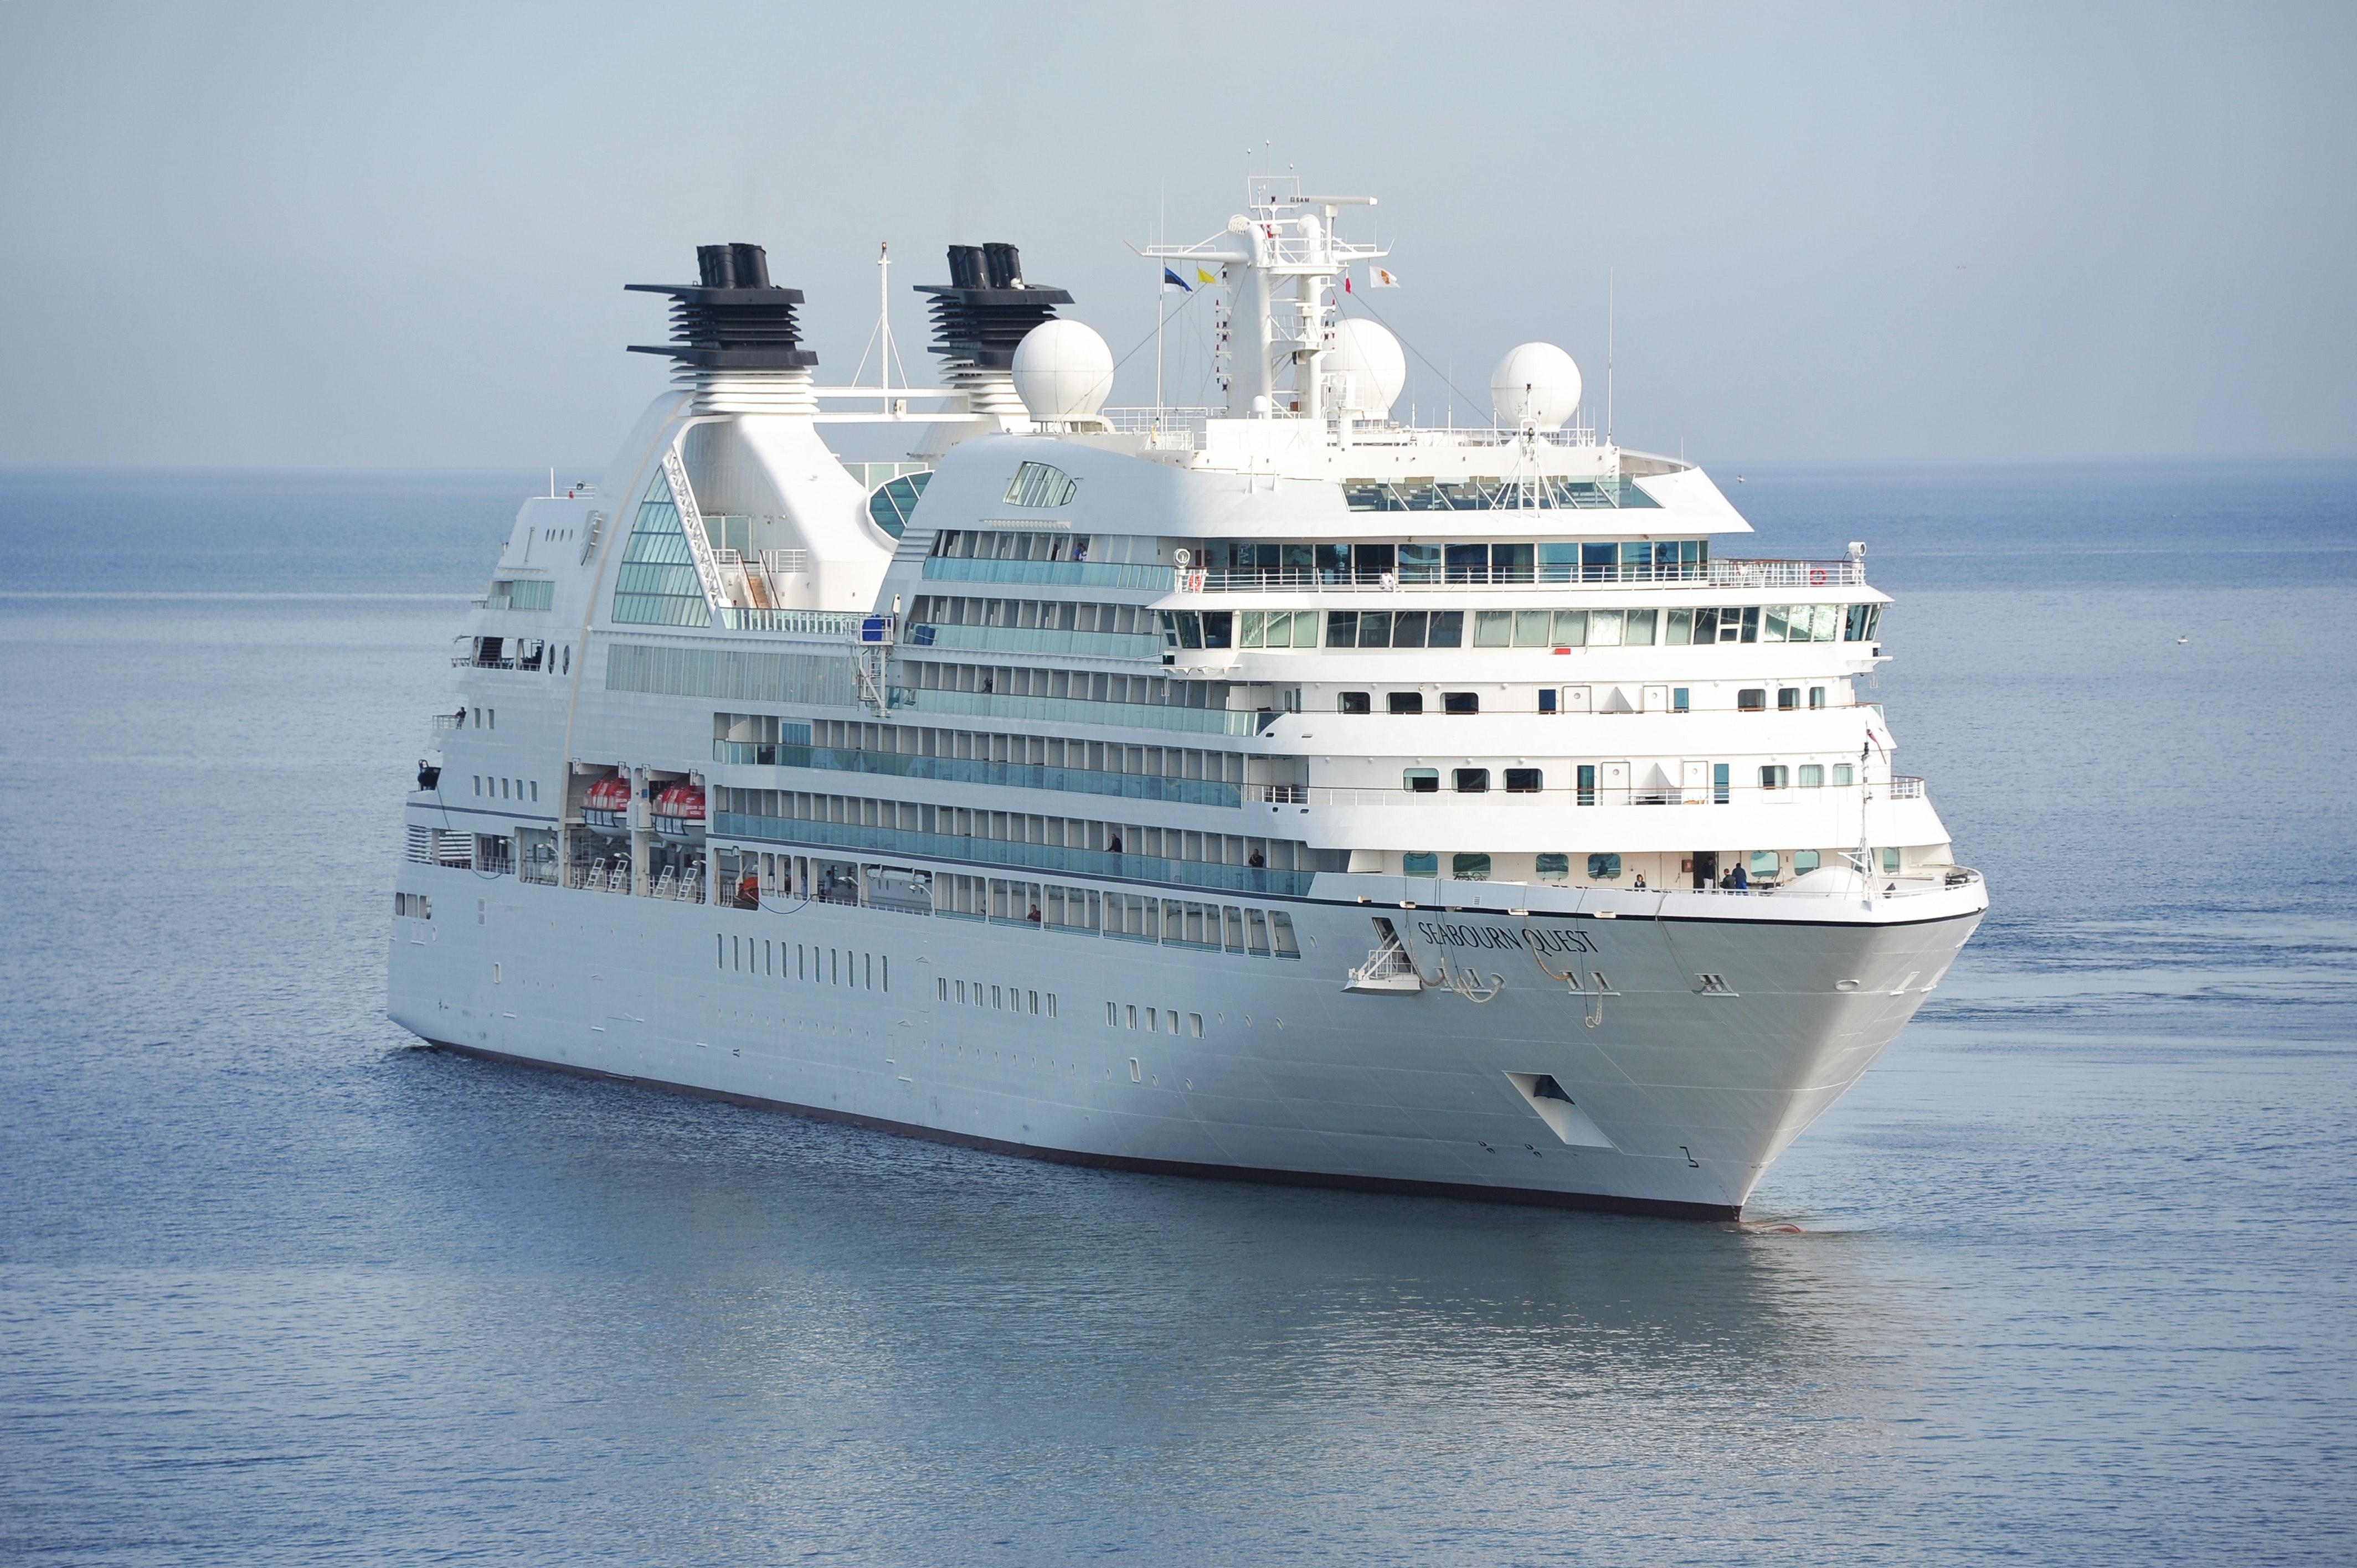 250+ Engaging Cruise Ship Photos · Pexels · Free Stock Photos